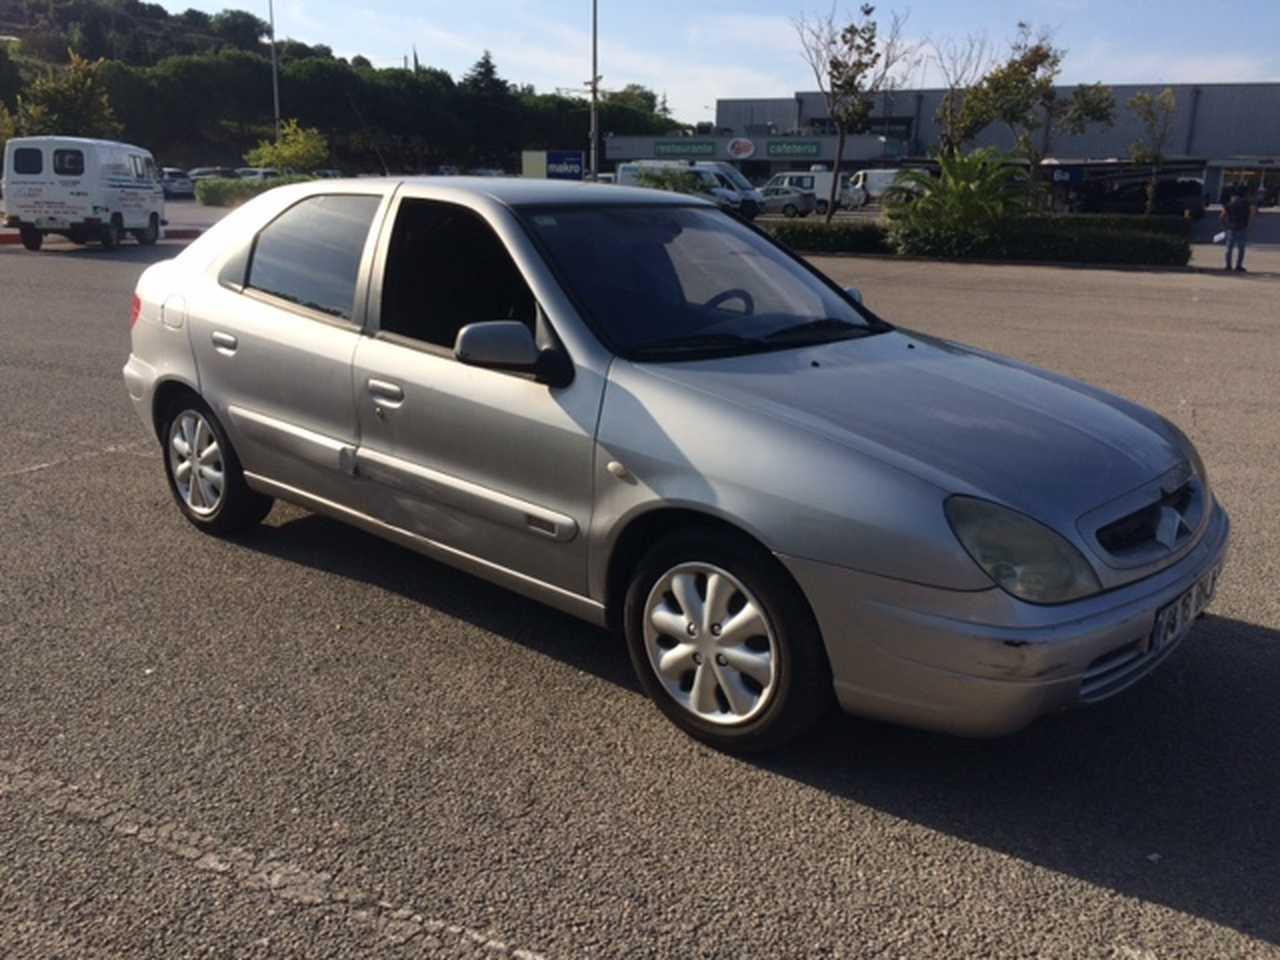 Citroën Xsara 2.0 HDI CONFORT   - Foto 1